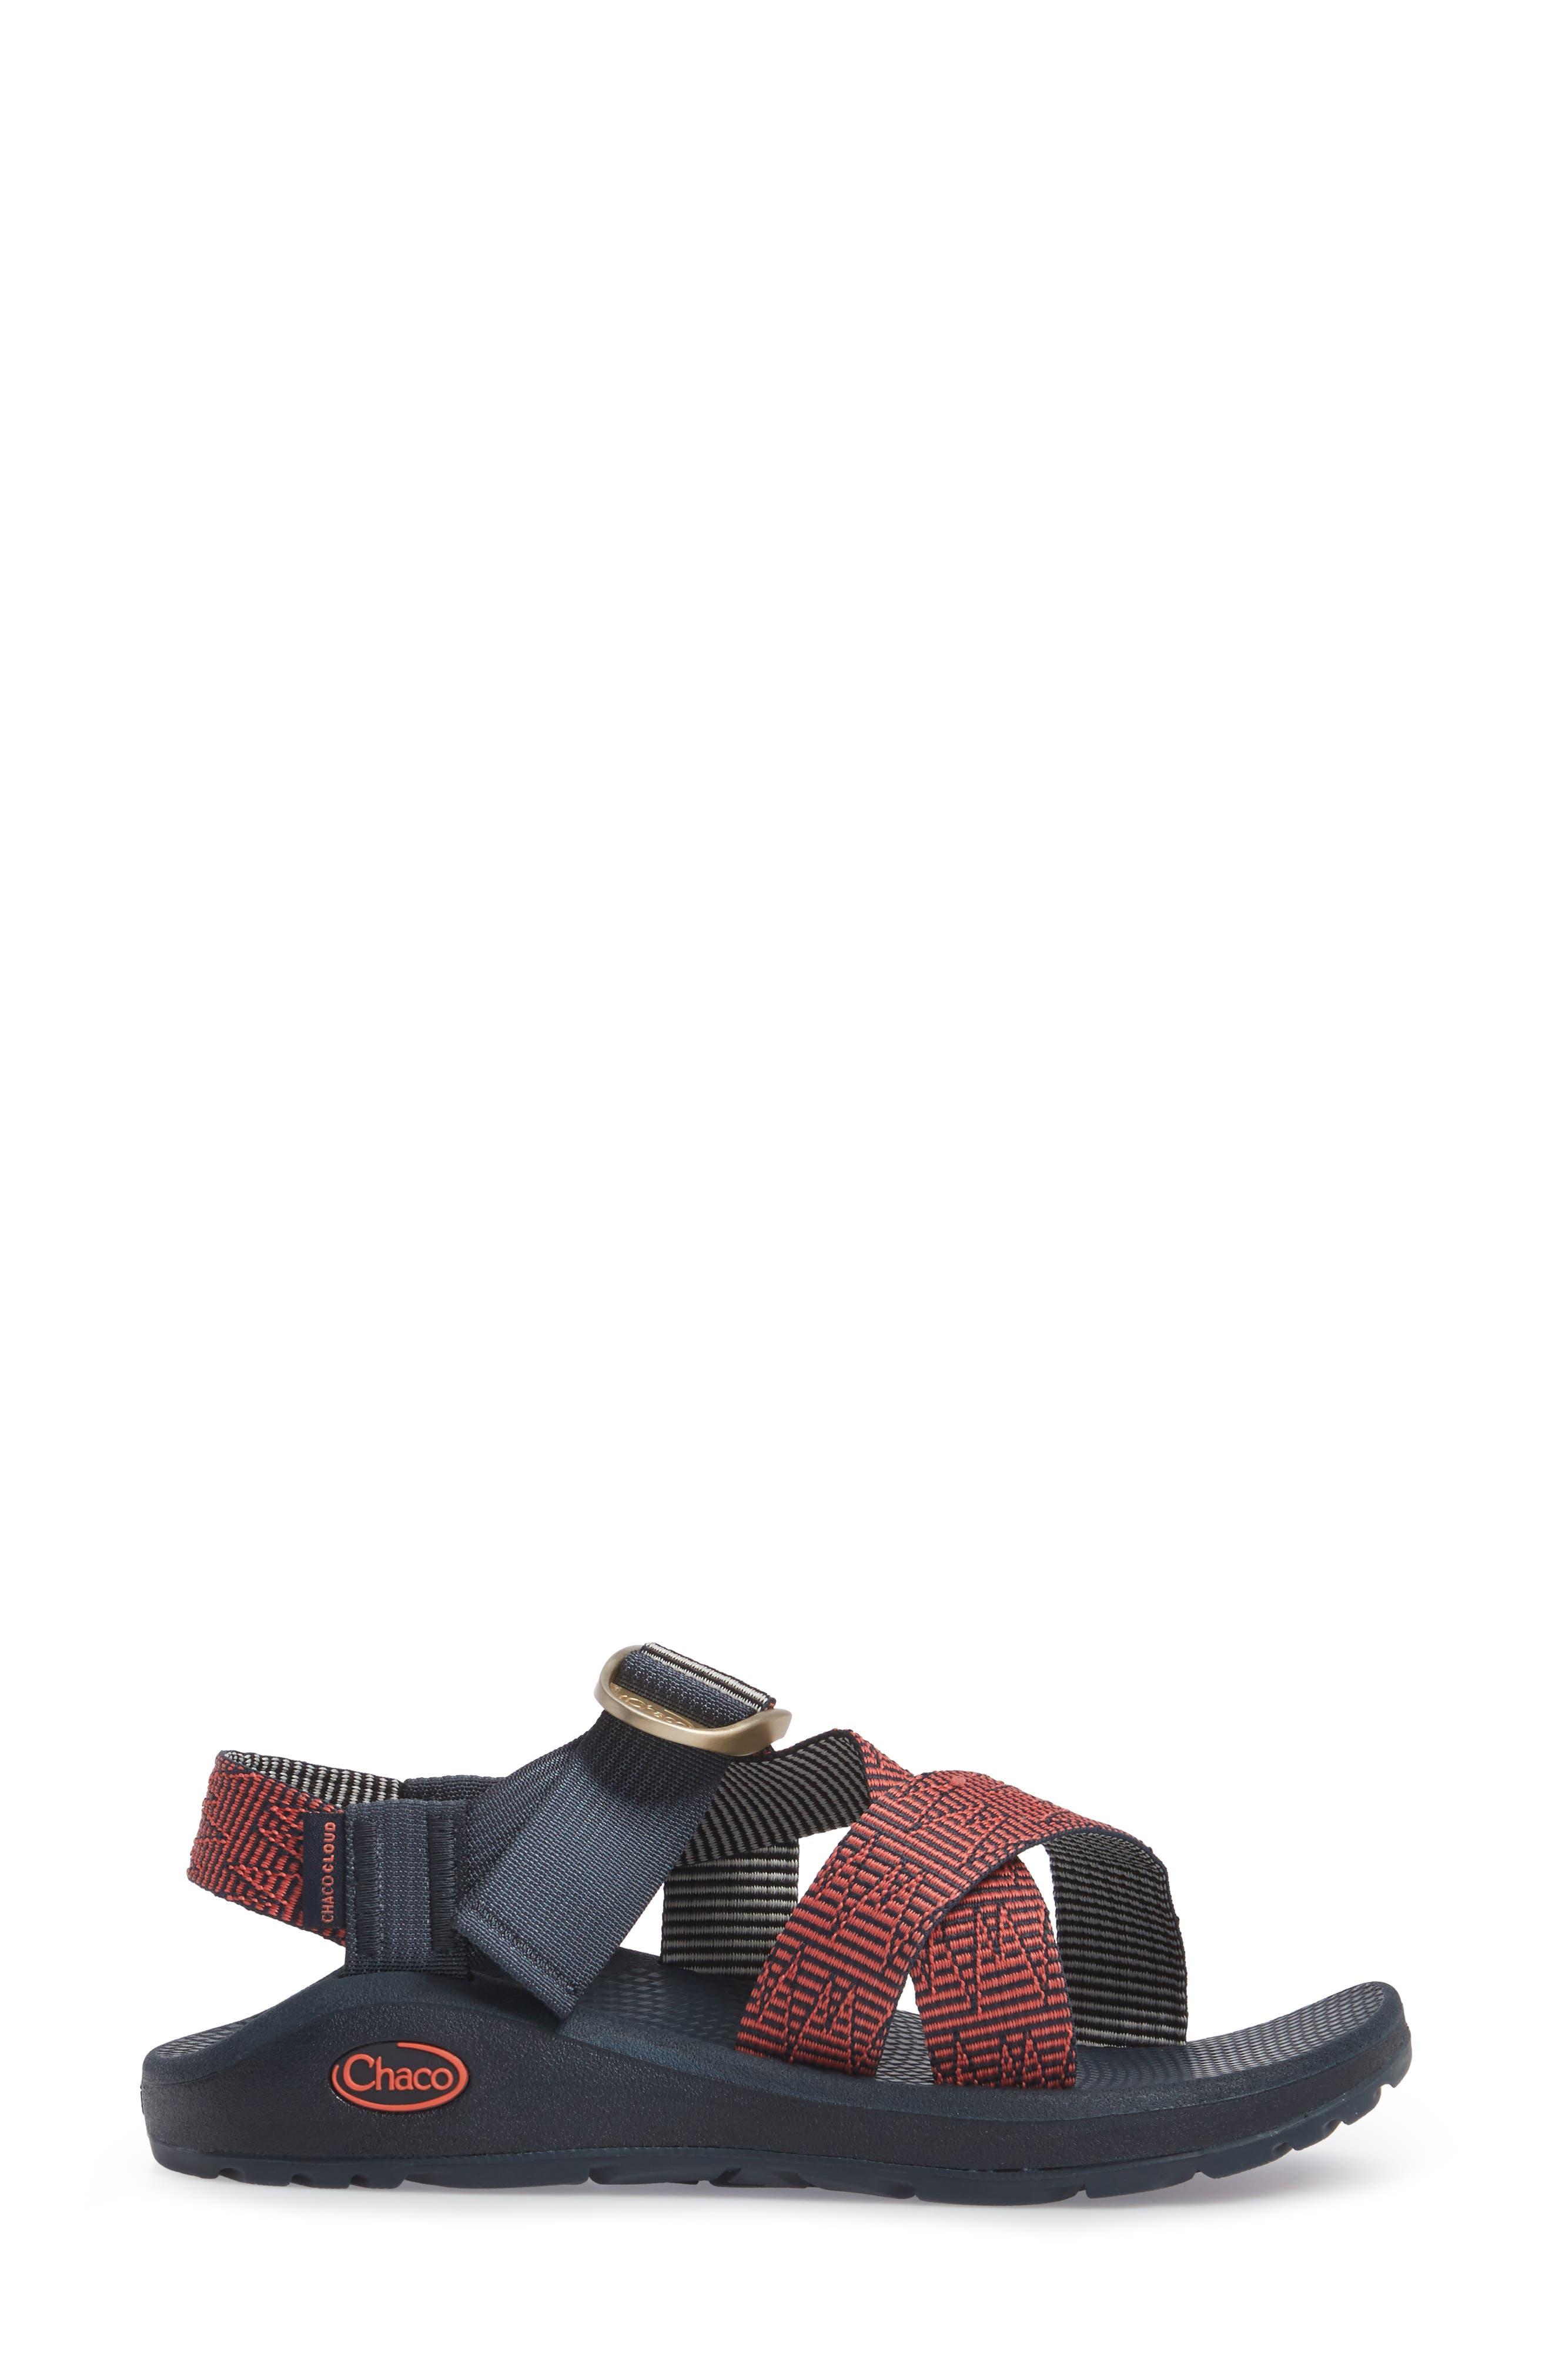 Mega Z/Cloud Sport Sandal,                             Alternate thumbnail 3, color,                             BLAZER NAVY